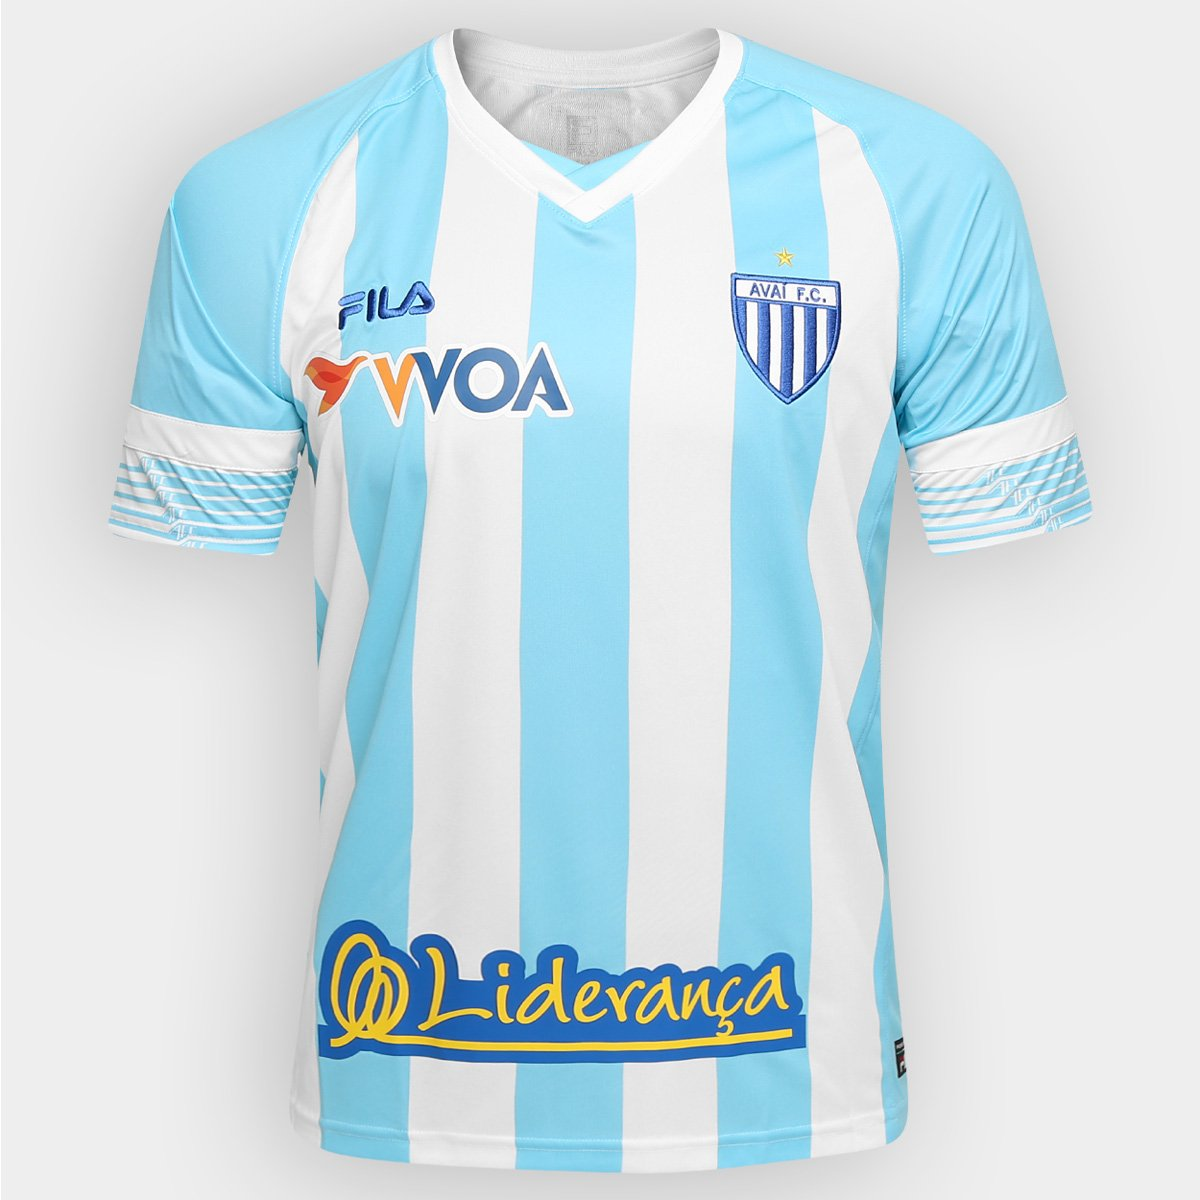 fd44b1b768 Camisa Avaí I 2016 s nº Torcedor Fila Masculina - Compre Agora ...